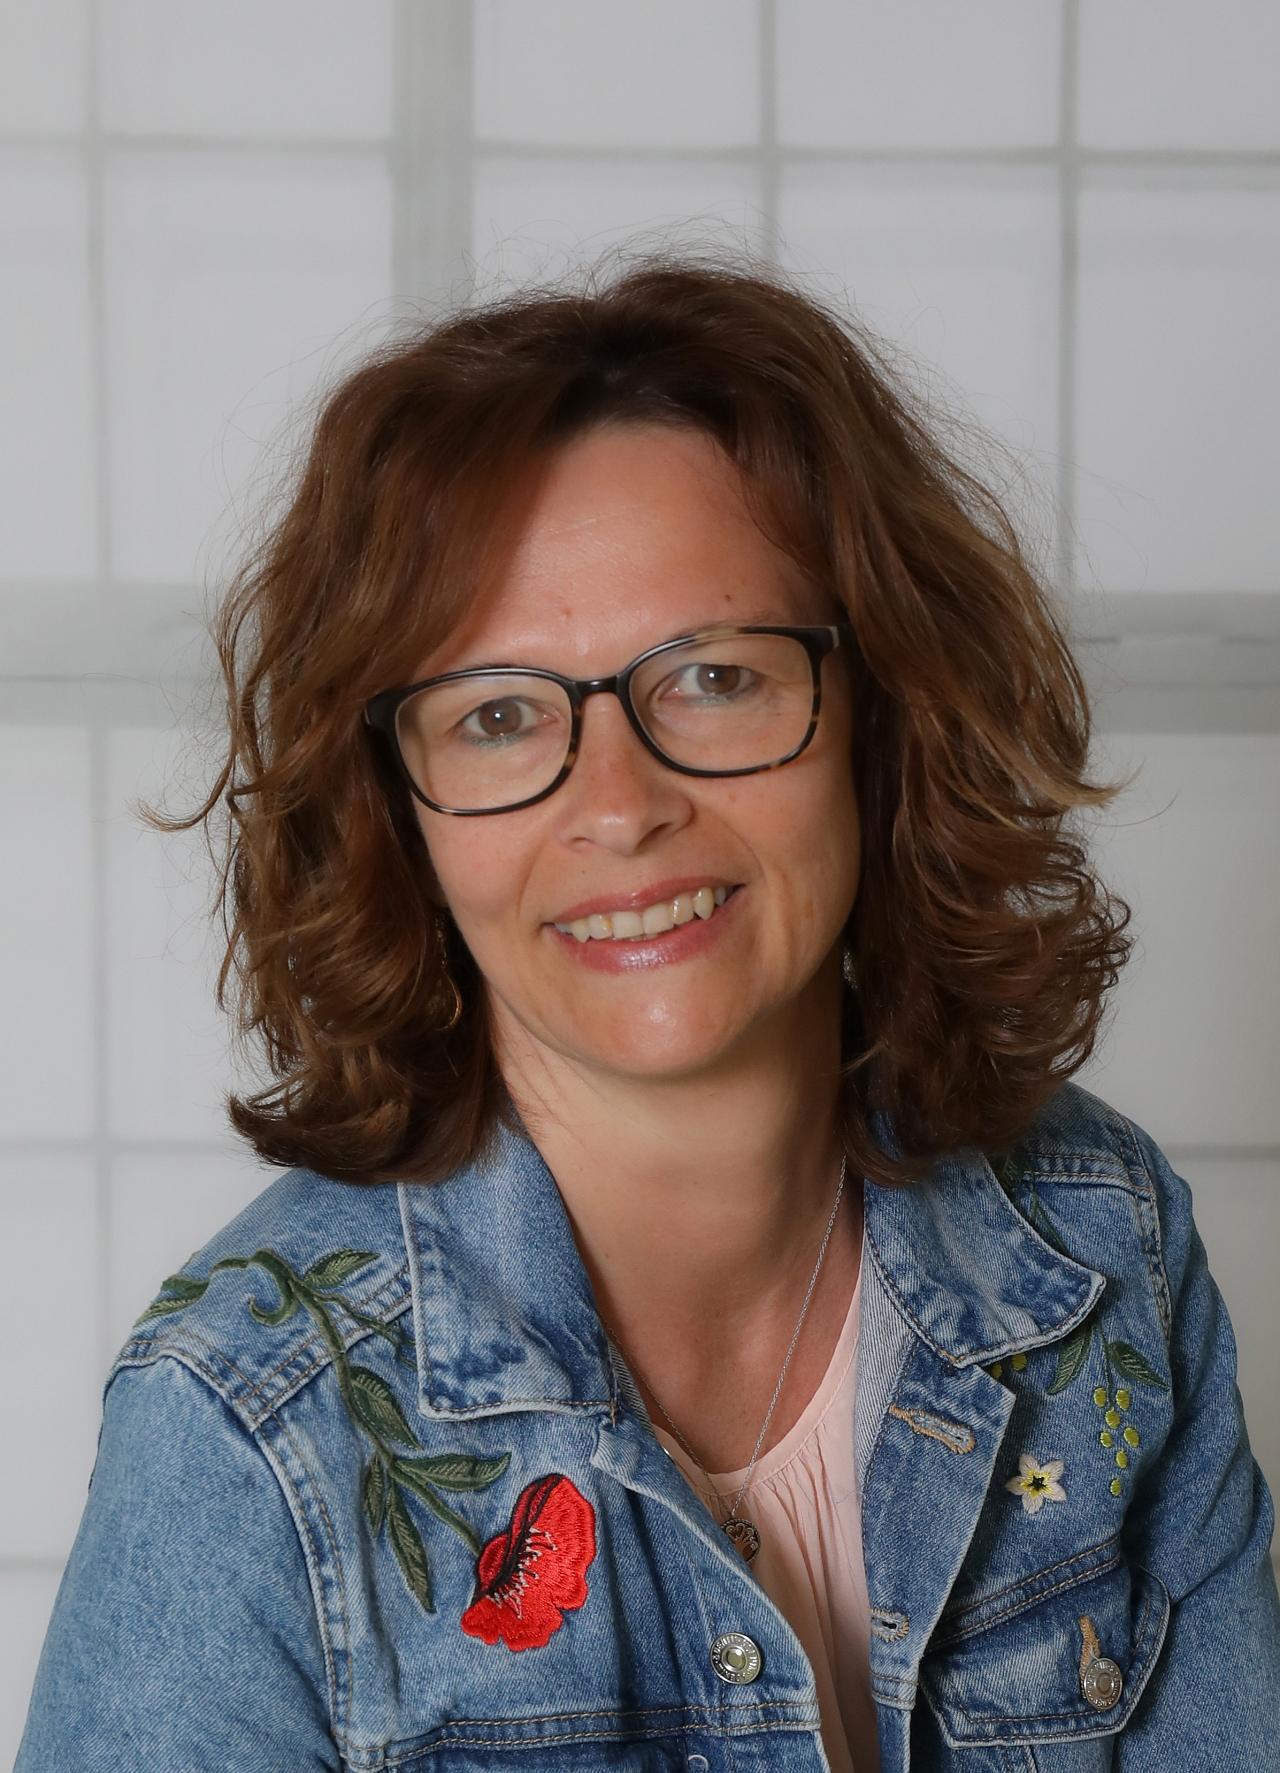 Margit Eichinger